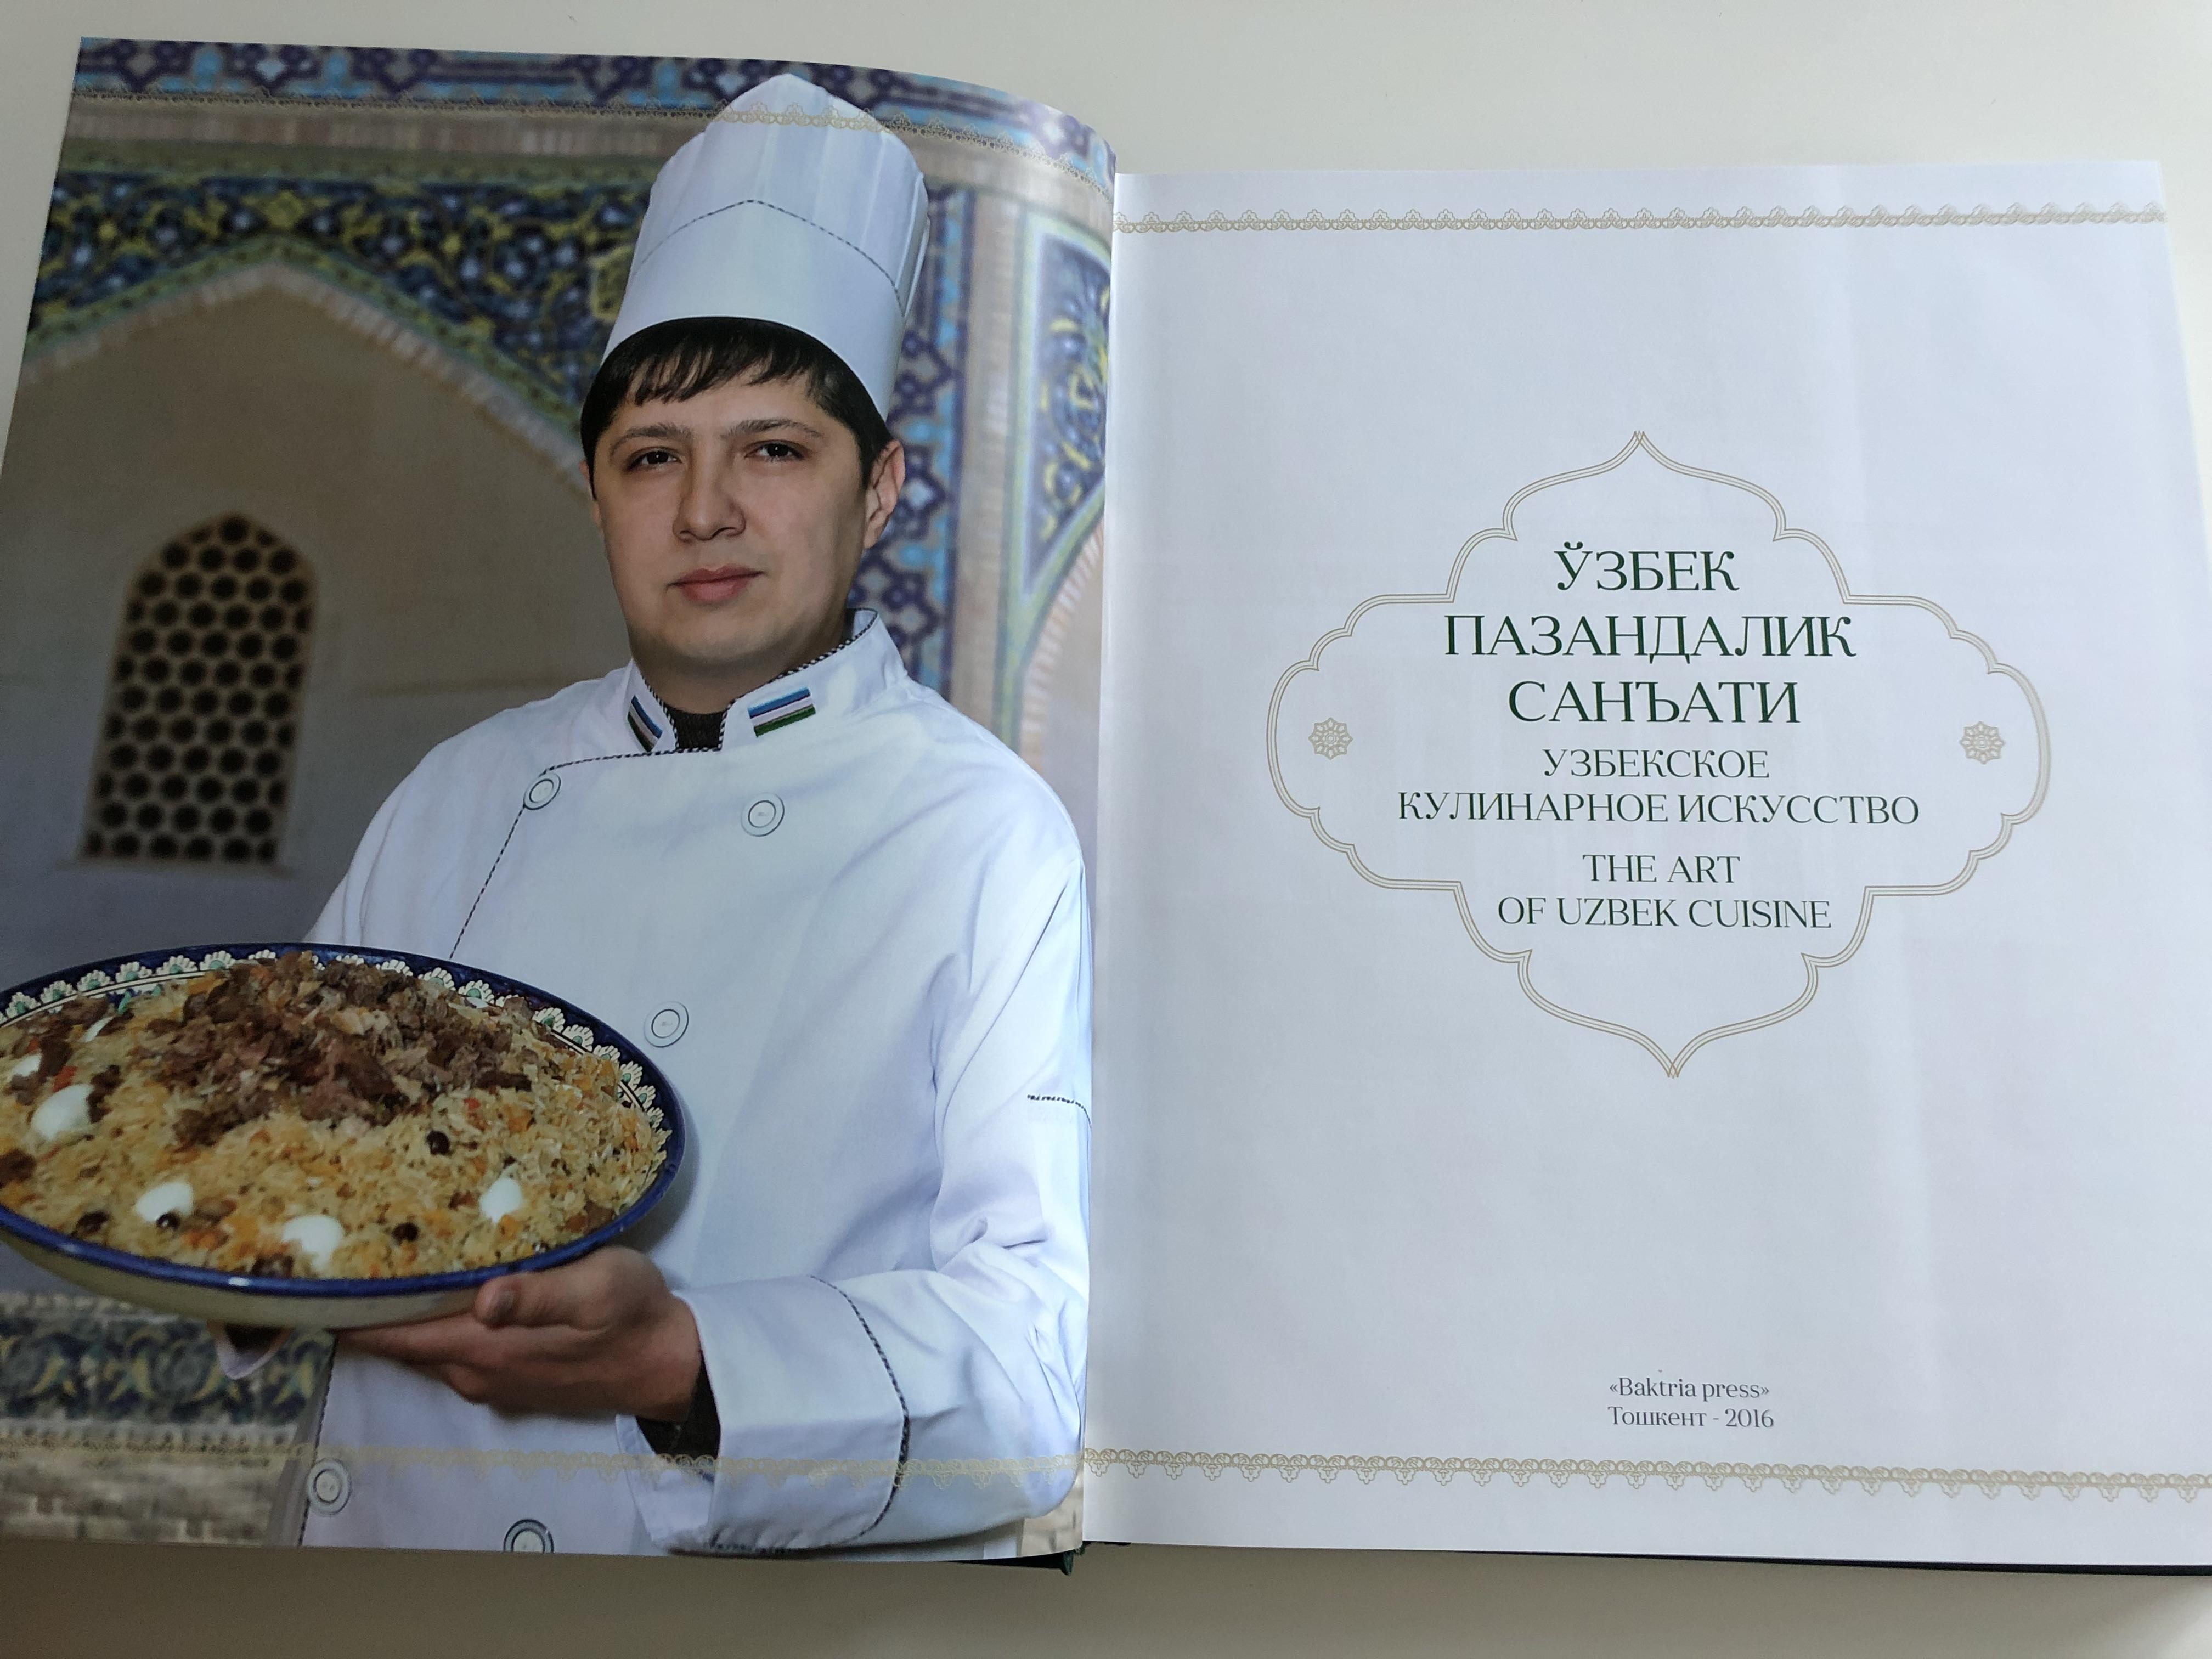 the-art-of-uzbek-cuisine-uzbek-russian-english-edition-hardcover-baktria-press-toshkent-2016-recipes-culture-cuisine-art-4-.jpg